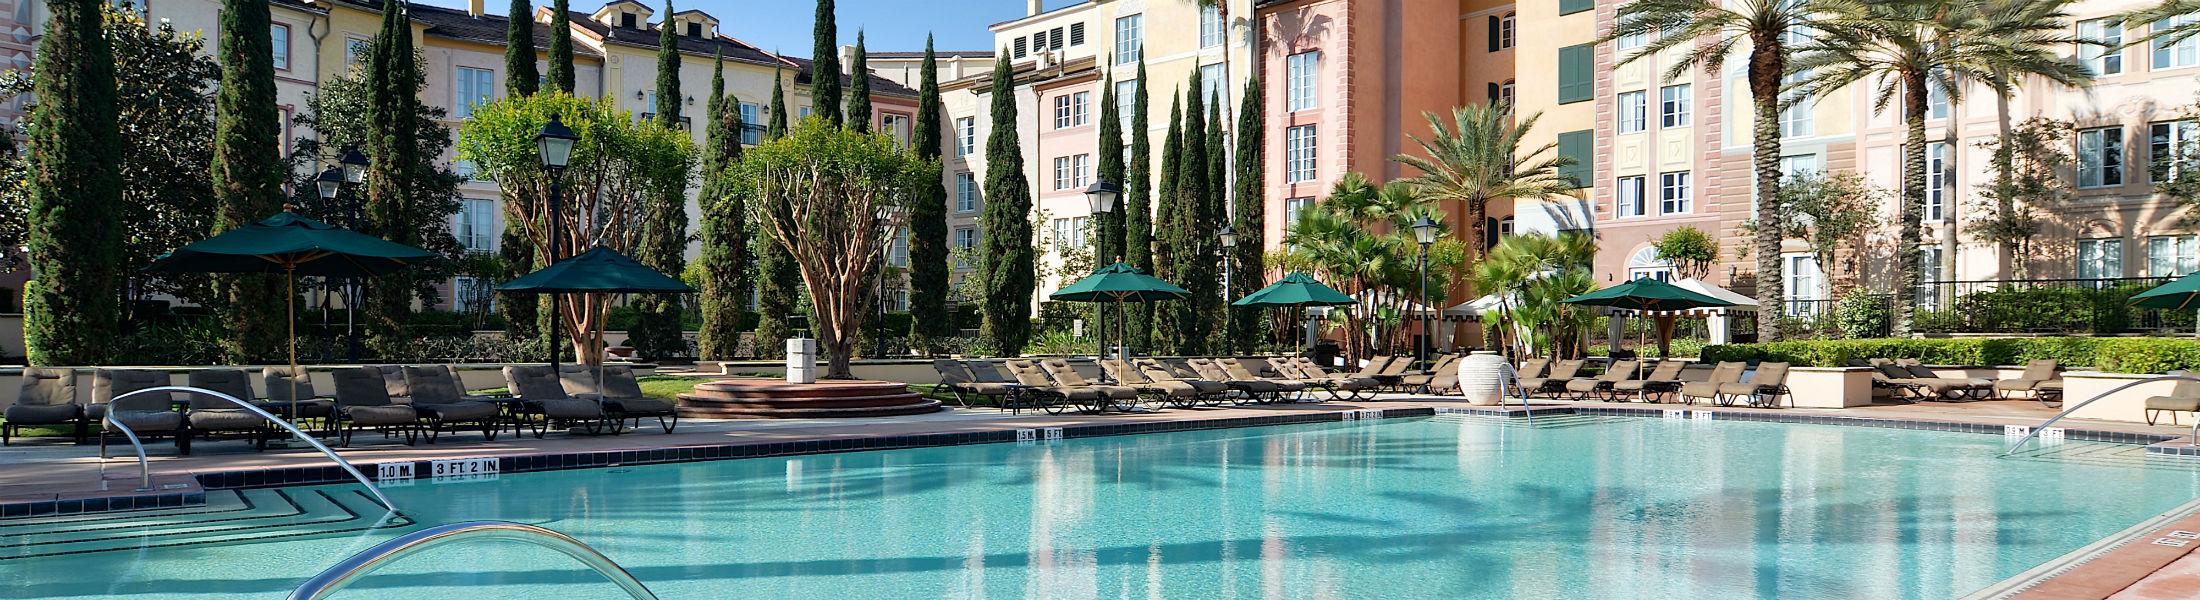 Main pool at the Loews Portofino Bay Hotel at Universal